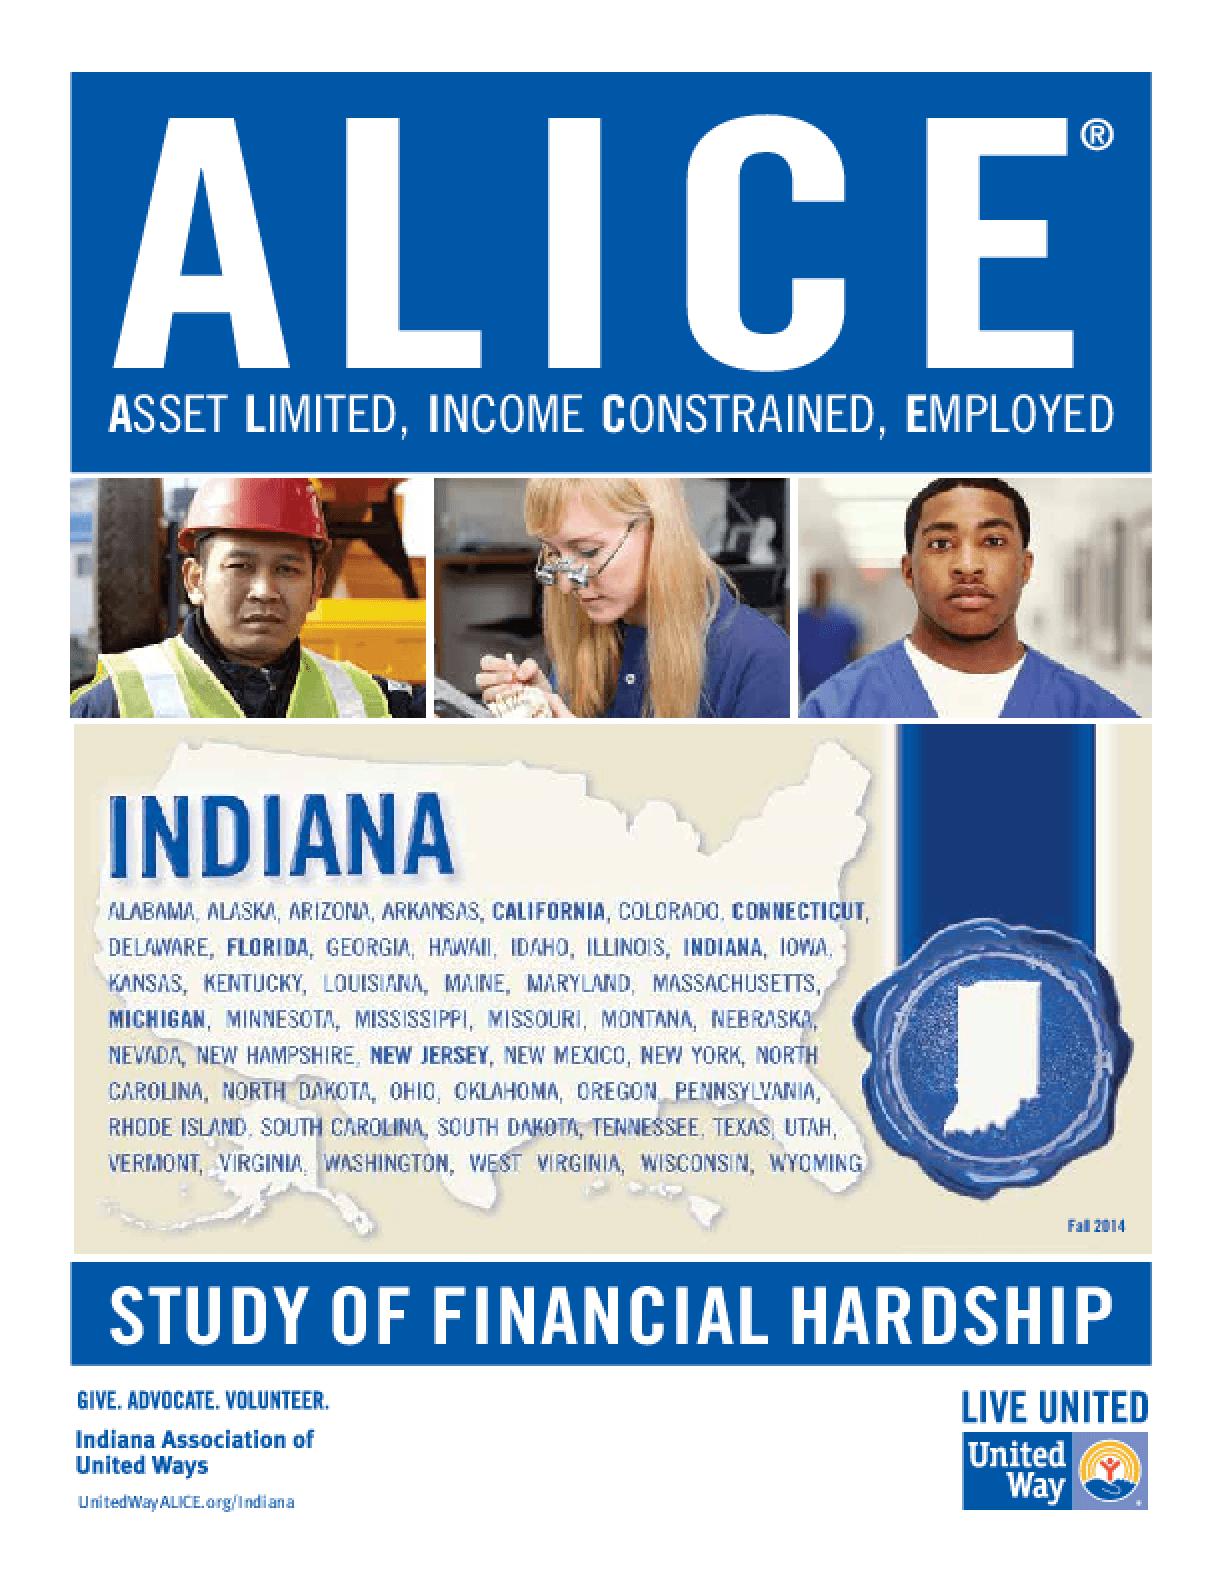 ALICE: Study of Financial Hardship-Indiana